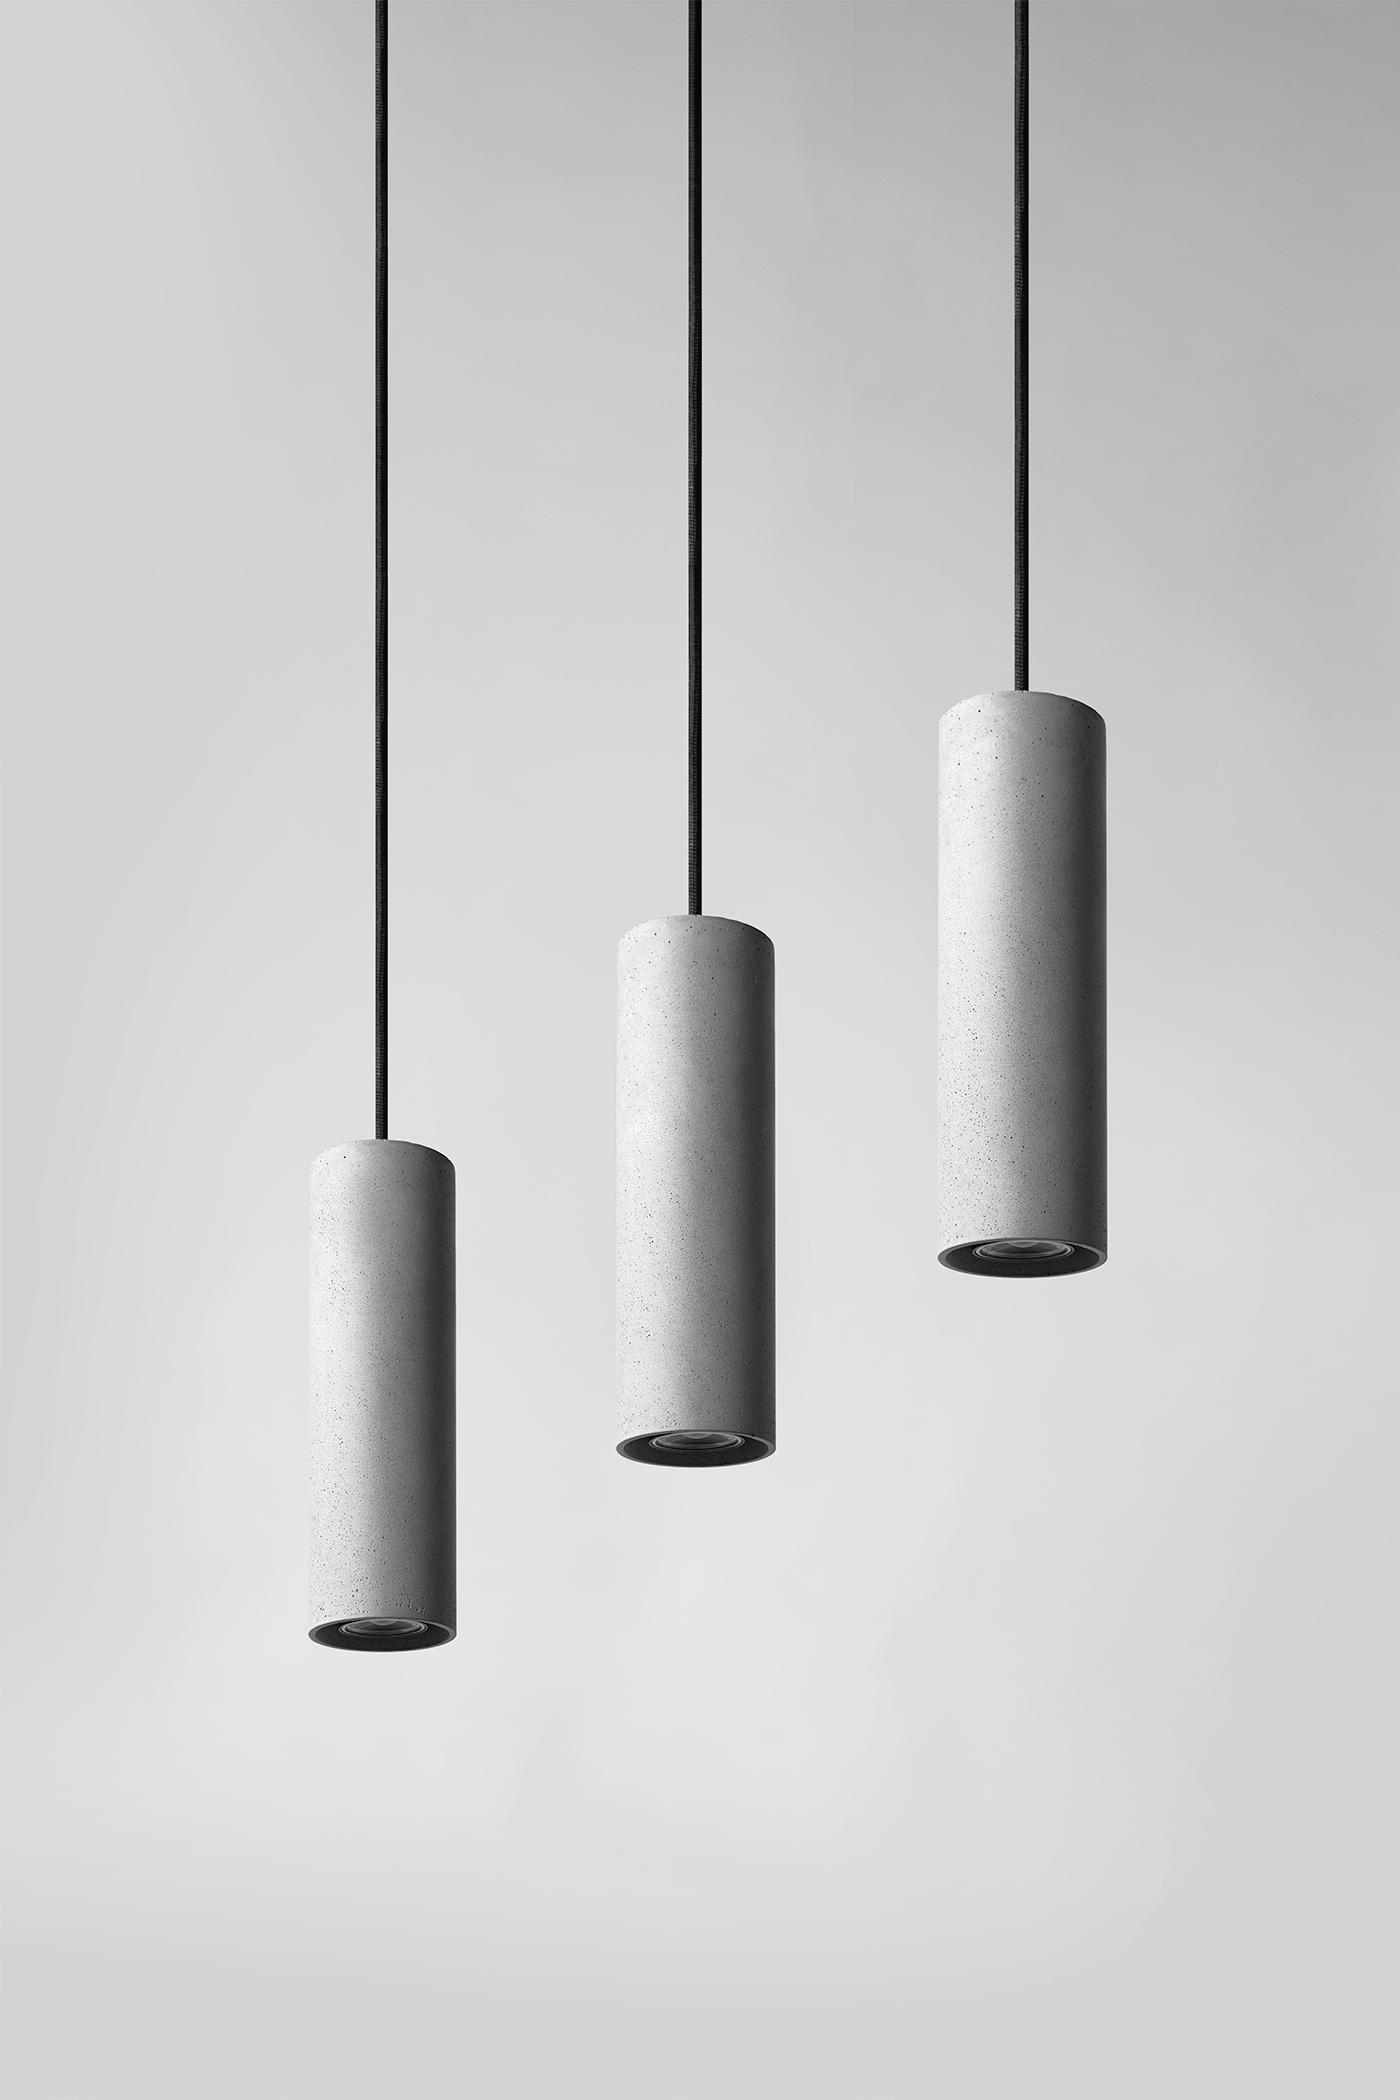 Zhu concrete pendant light by Bentu